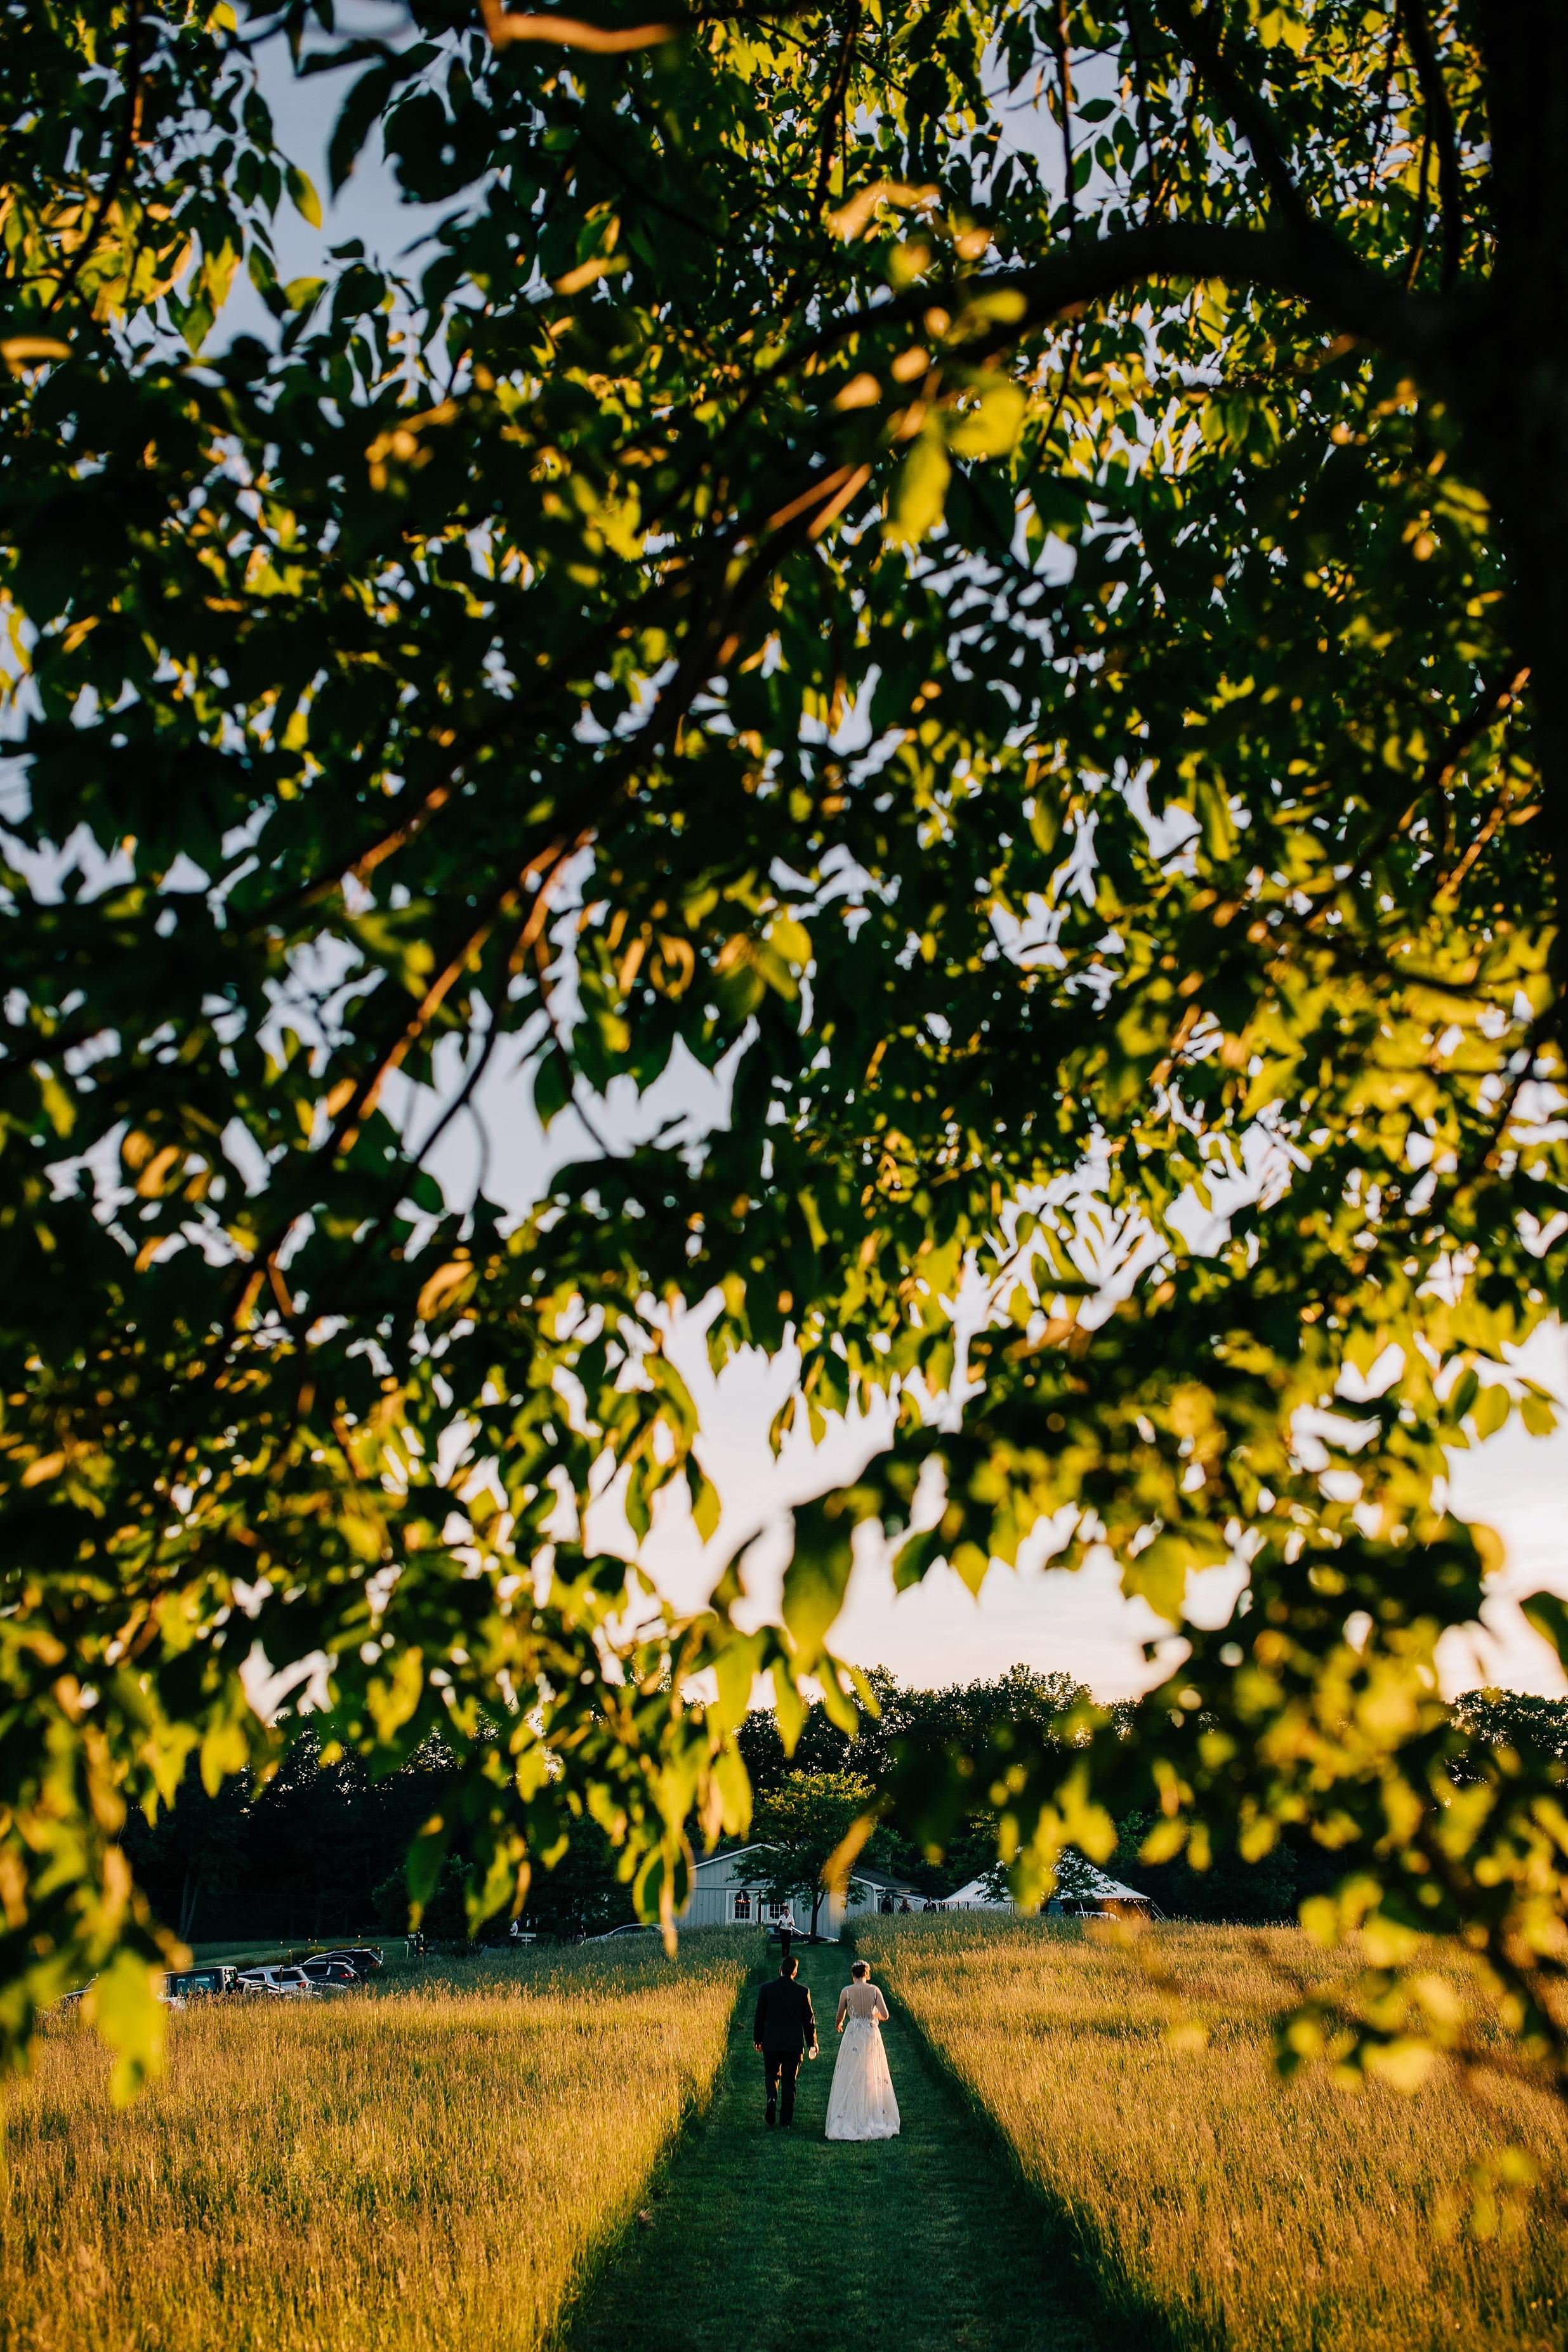 historic-upstate-ny-wedding-church-backyard-photographer_0034.jpg